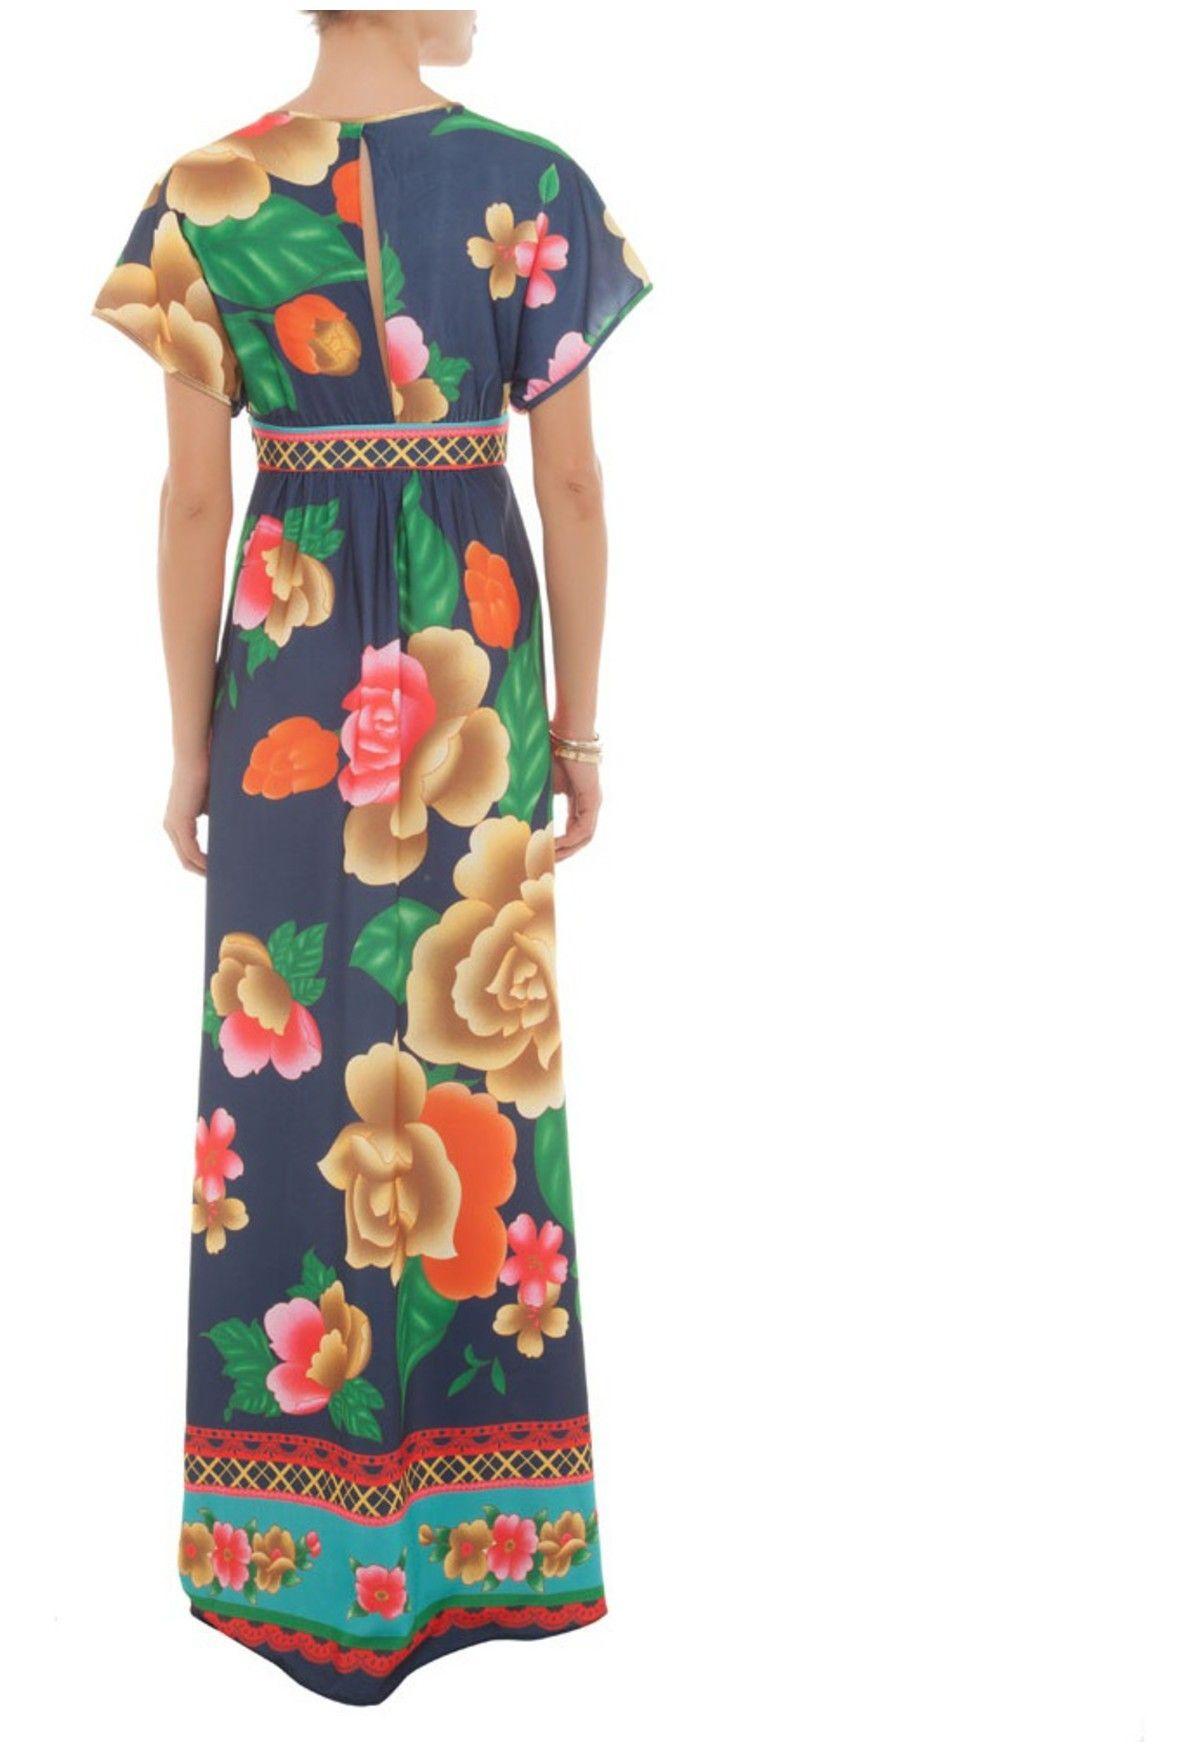 cdb3390e1 FARM - Vestido longo floral - azul e verde - OQVestir